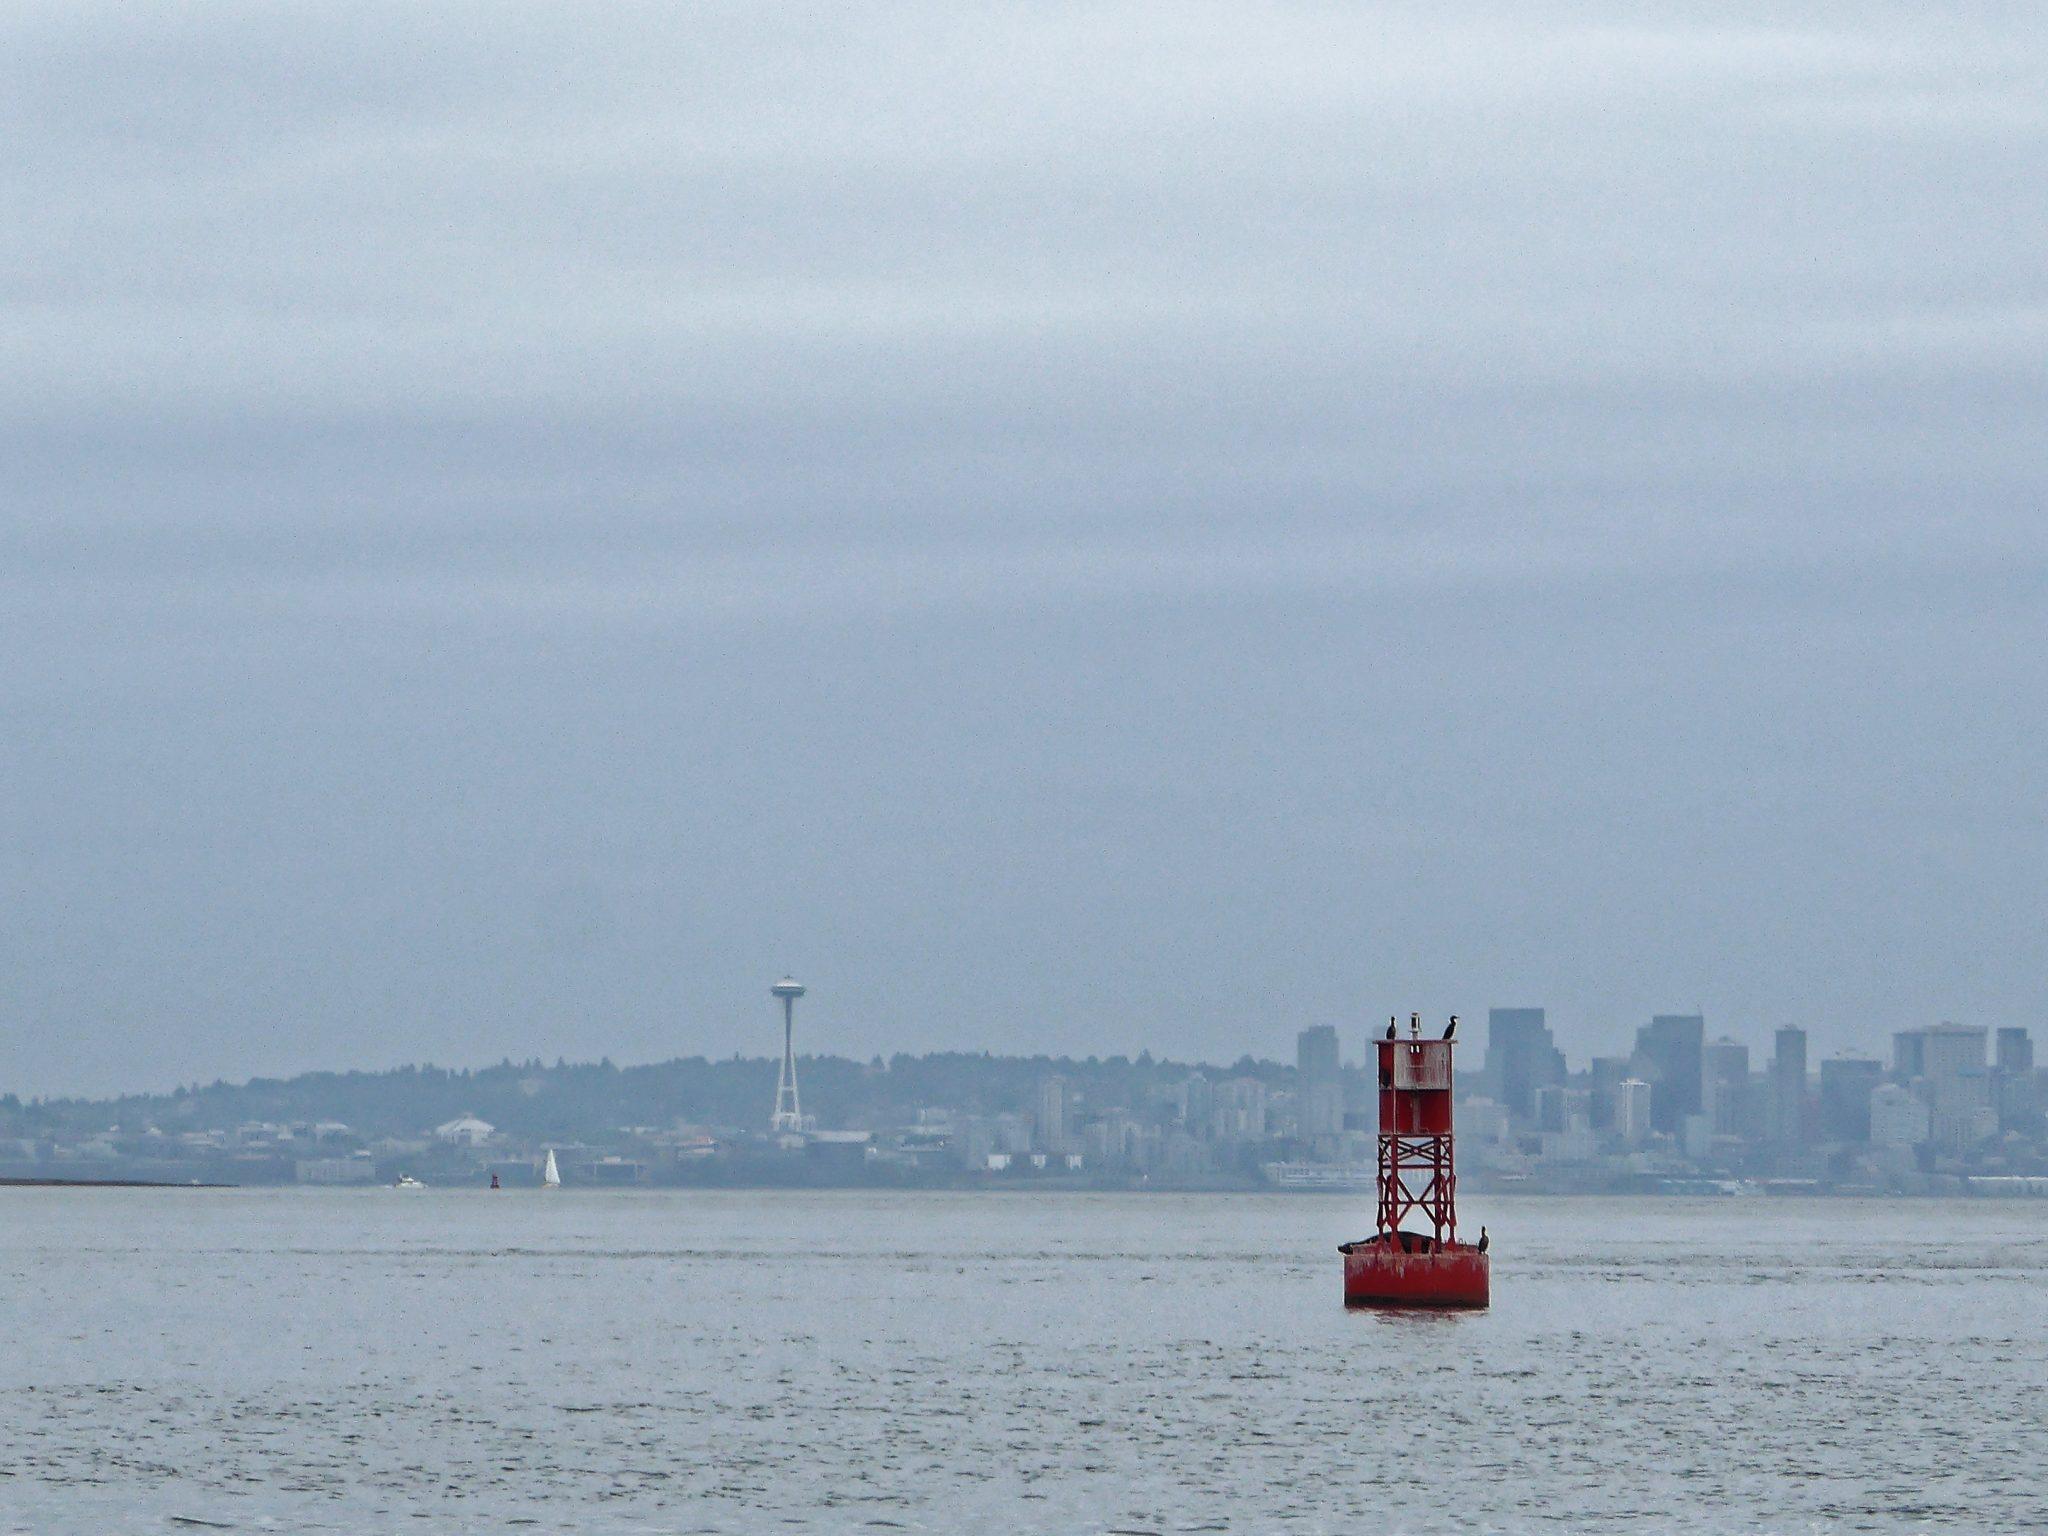 Buoy and Seattle skyline near Bainbridge Island